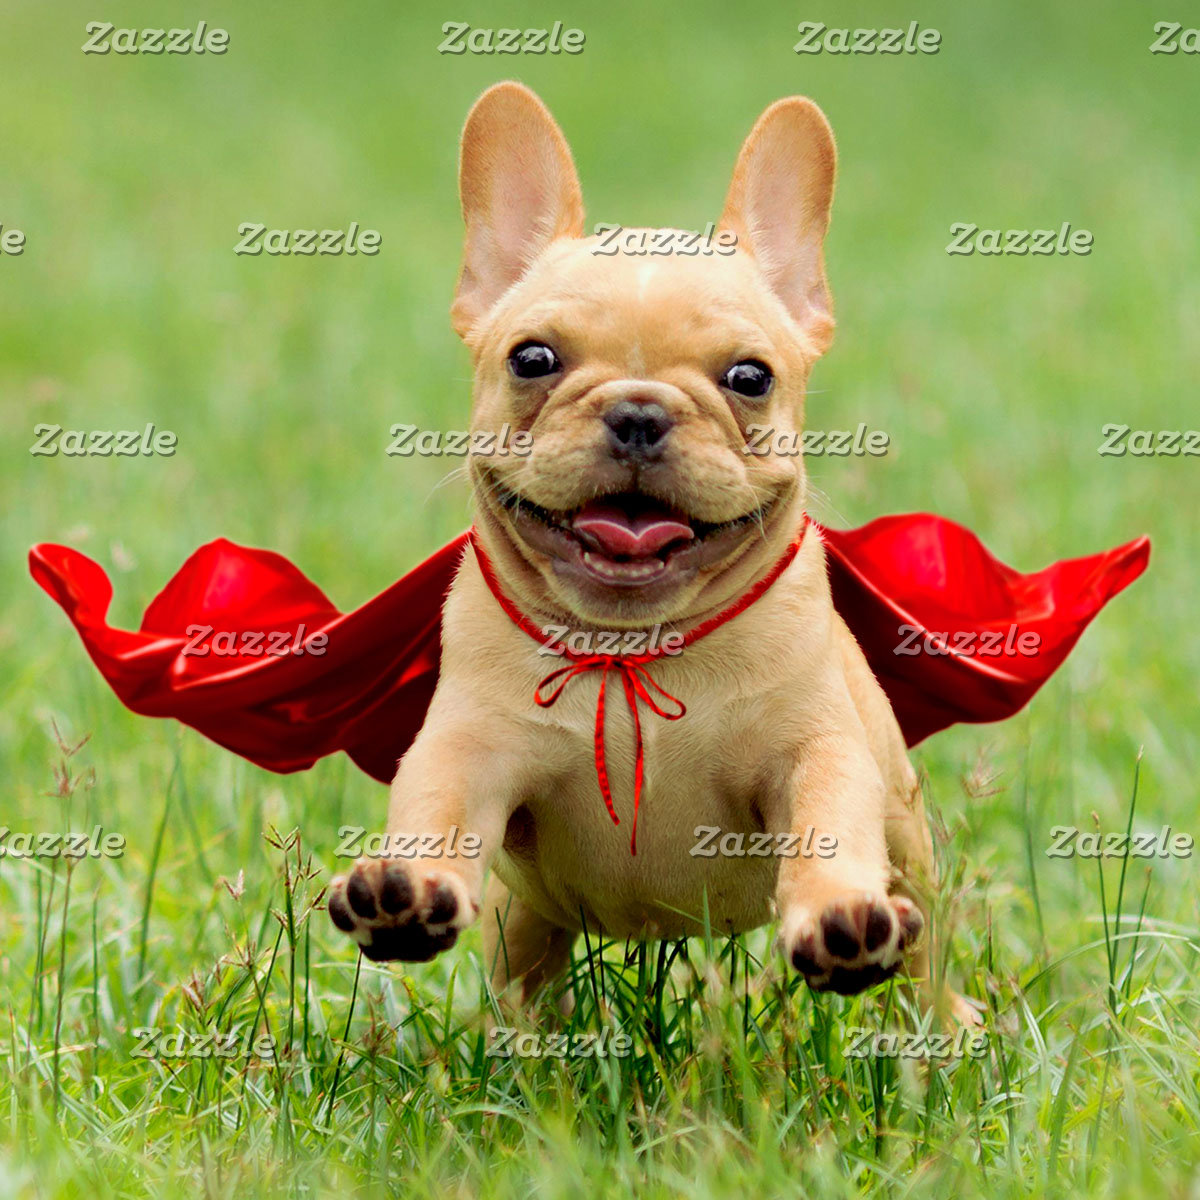 Cute French Bulldog Superhero Runs in Grass